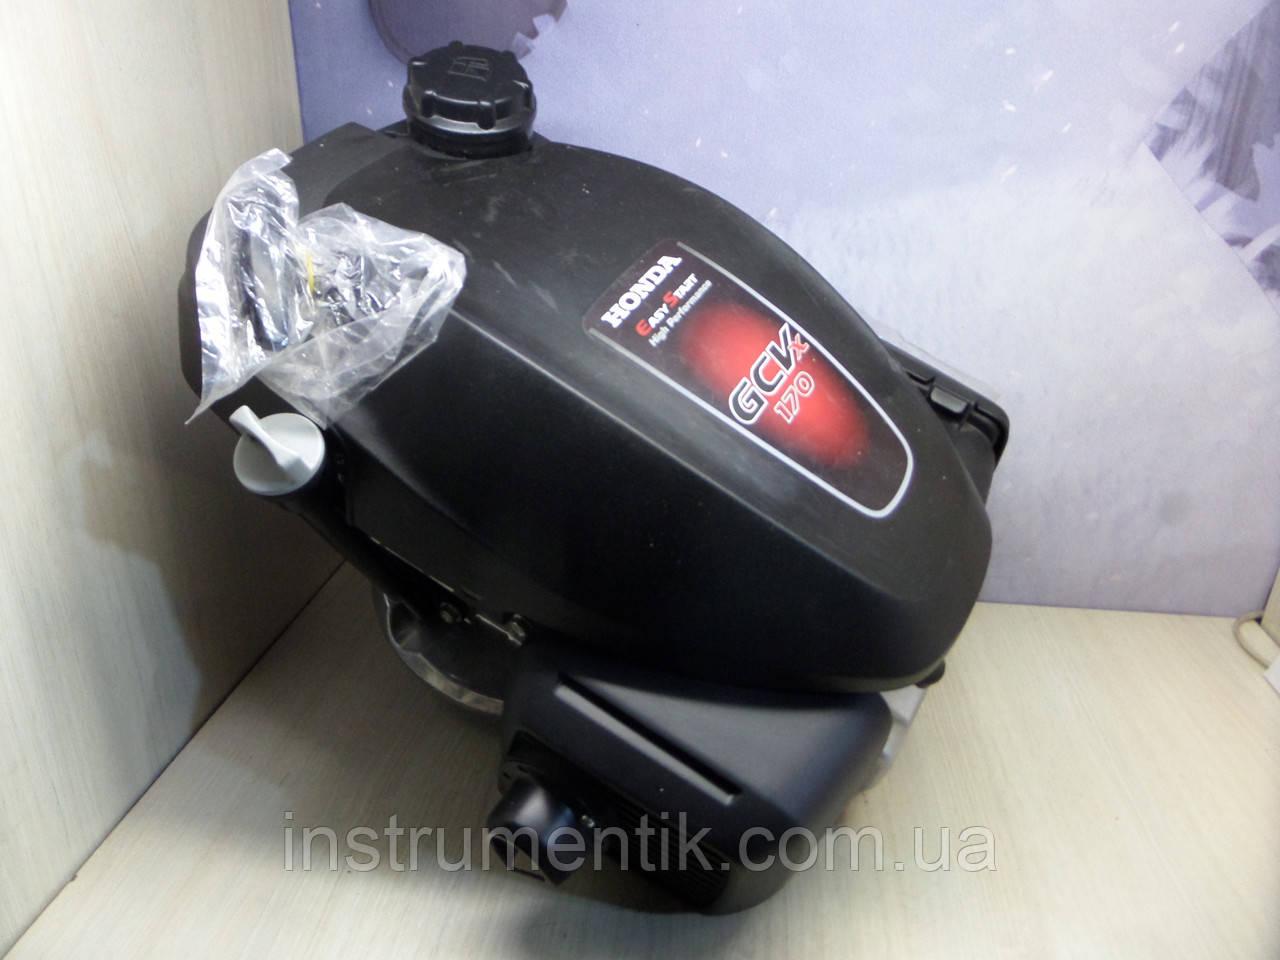 Двигатель для мотокультиватора  Dragon 55H (Honda GCV 170 )